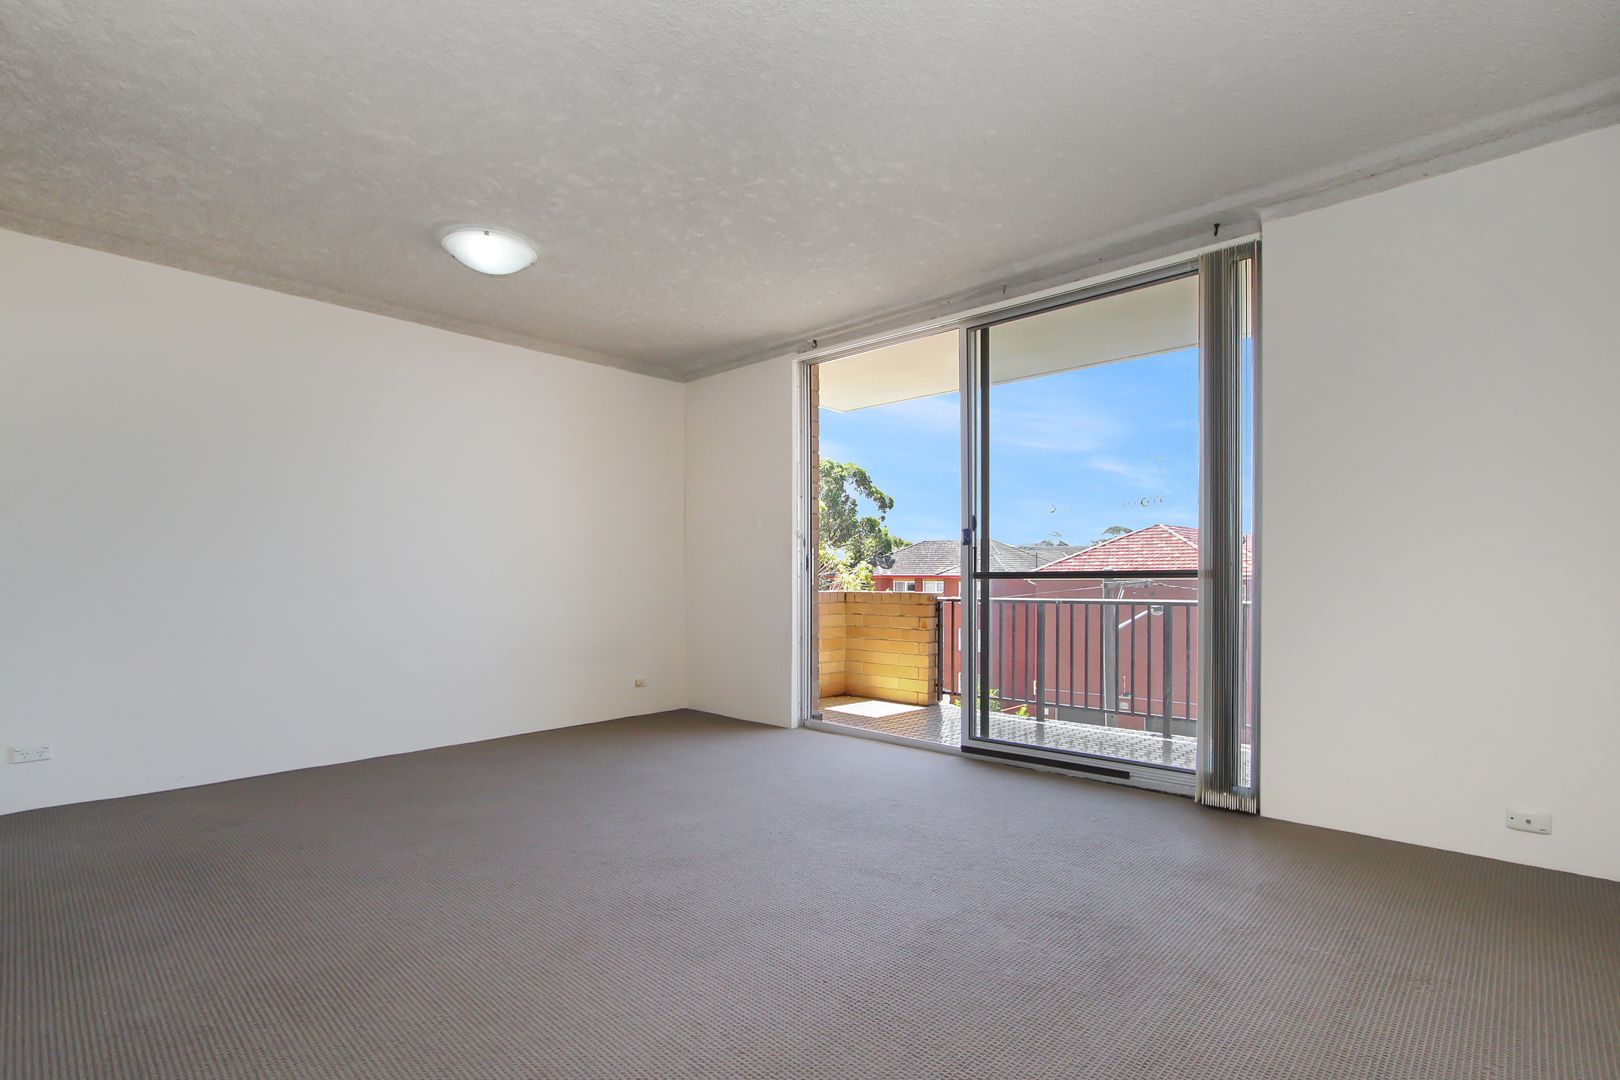 27/7-9 Cross Street, Kogarah NSW 2217, Image 1